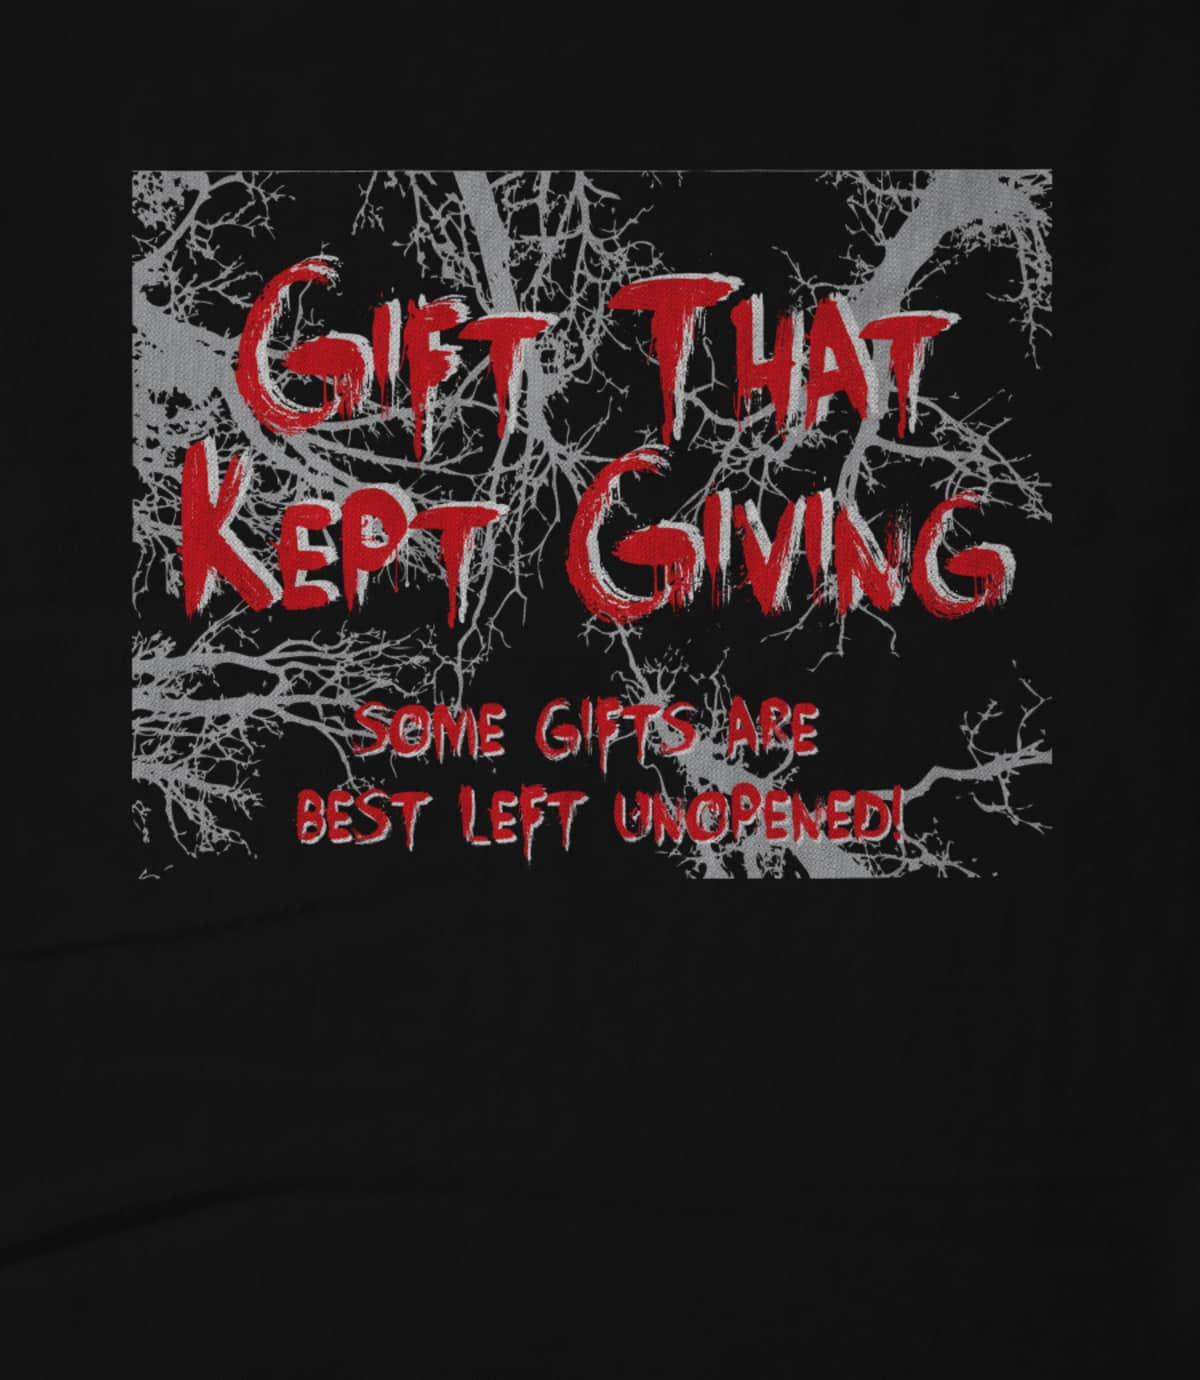 GIFT THAT KEPT GIVING